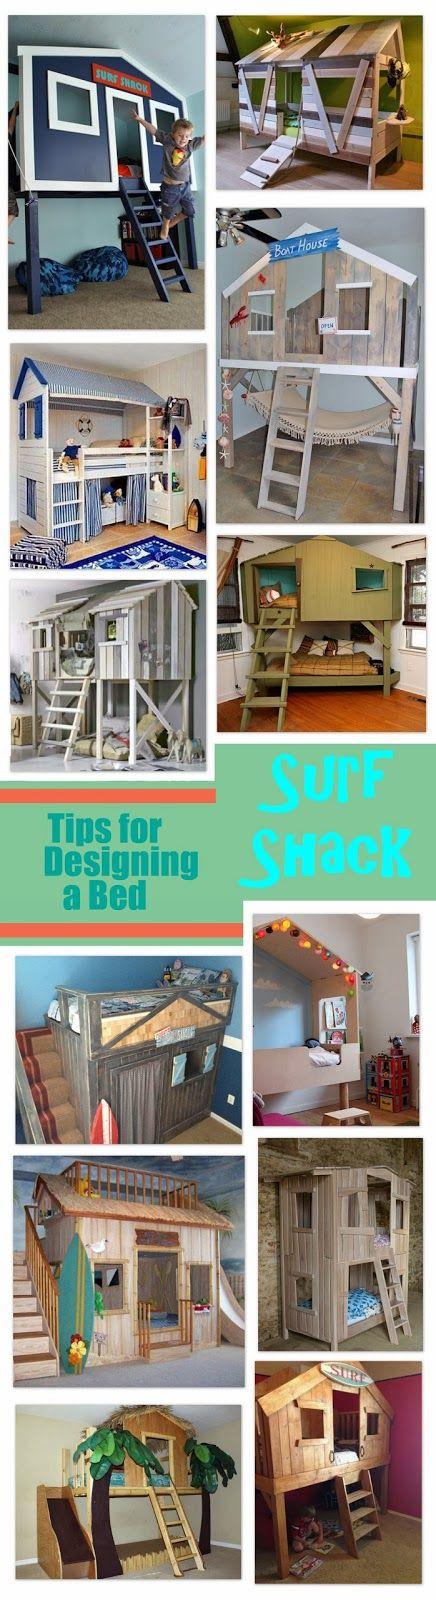 Muchas camas bunker!  Designing a Surf Shack Bed - Smart Girls DIY